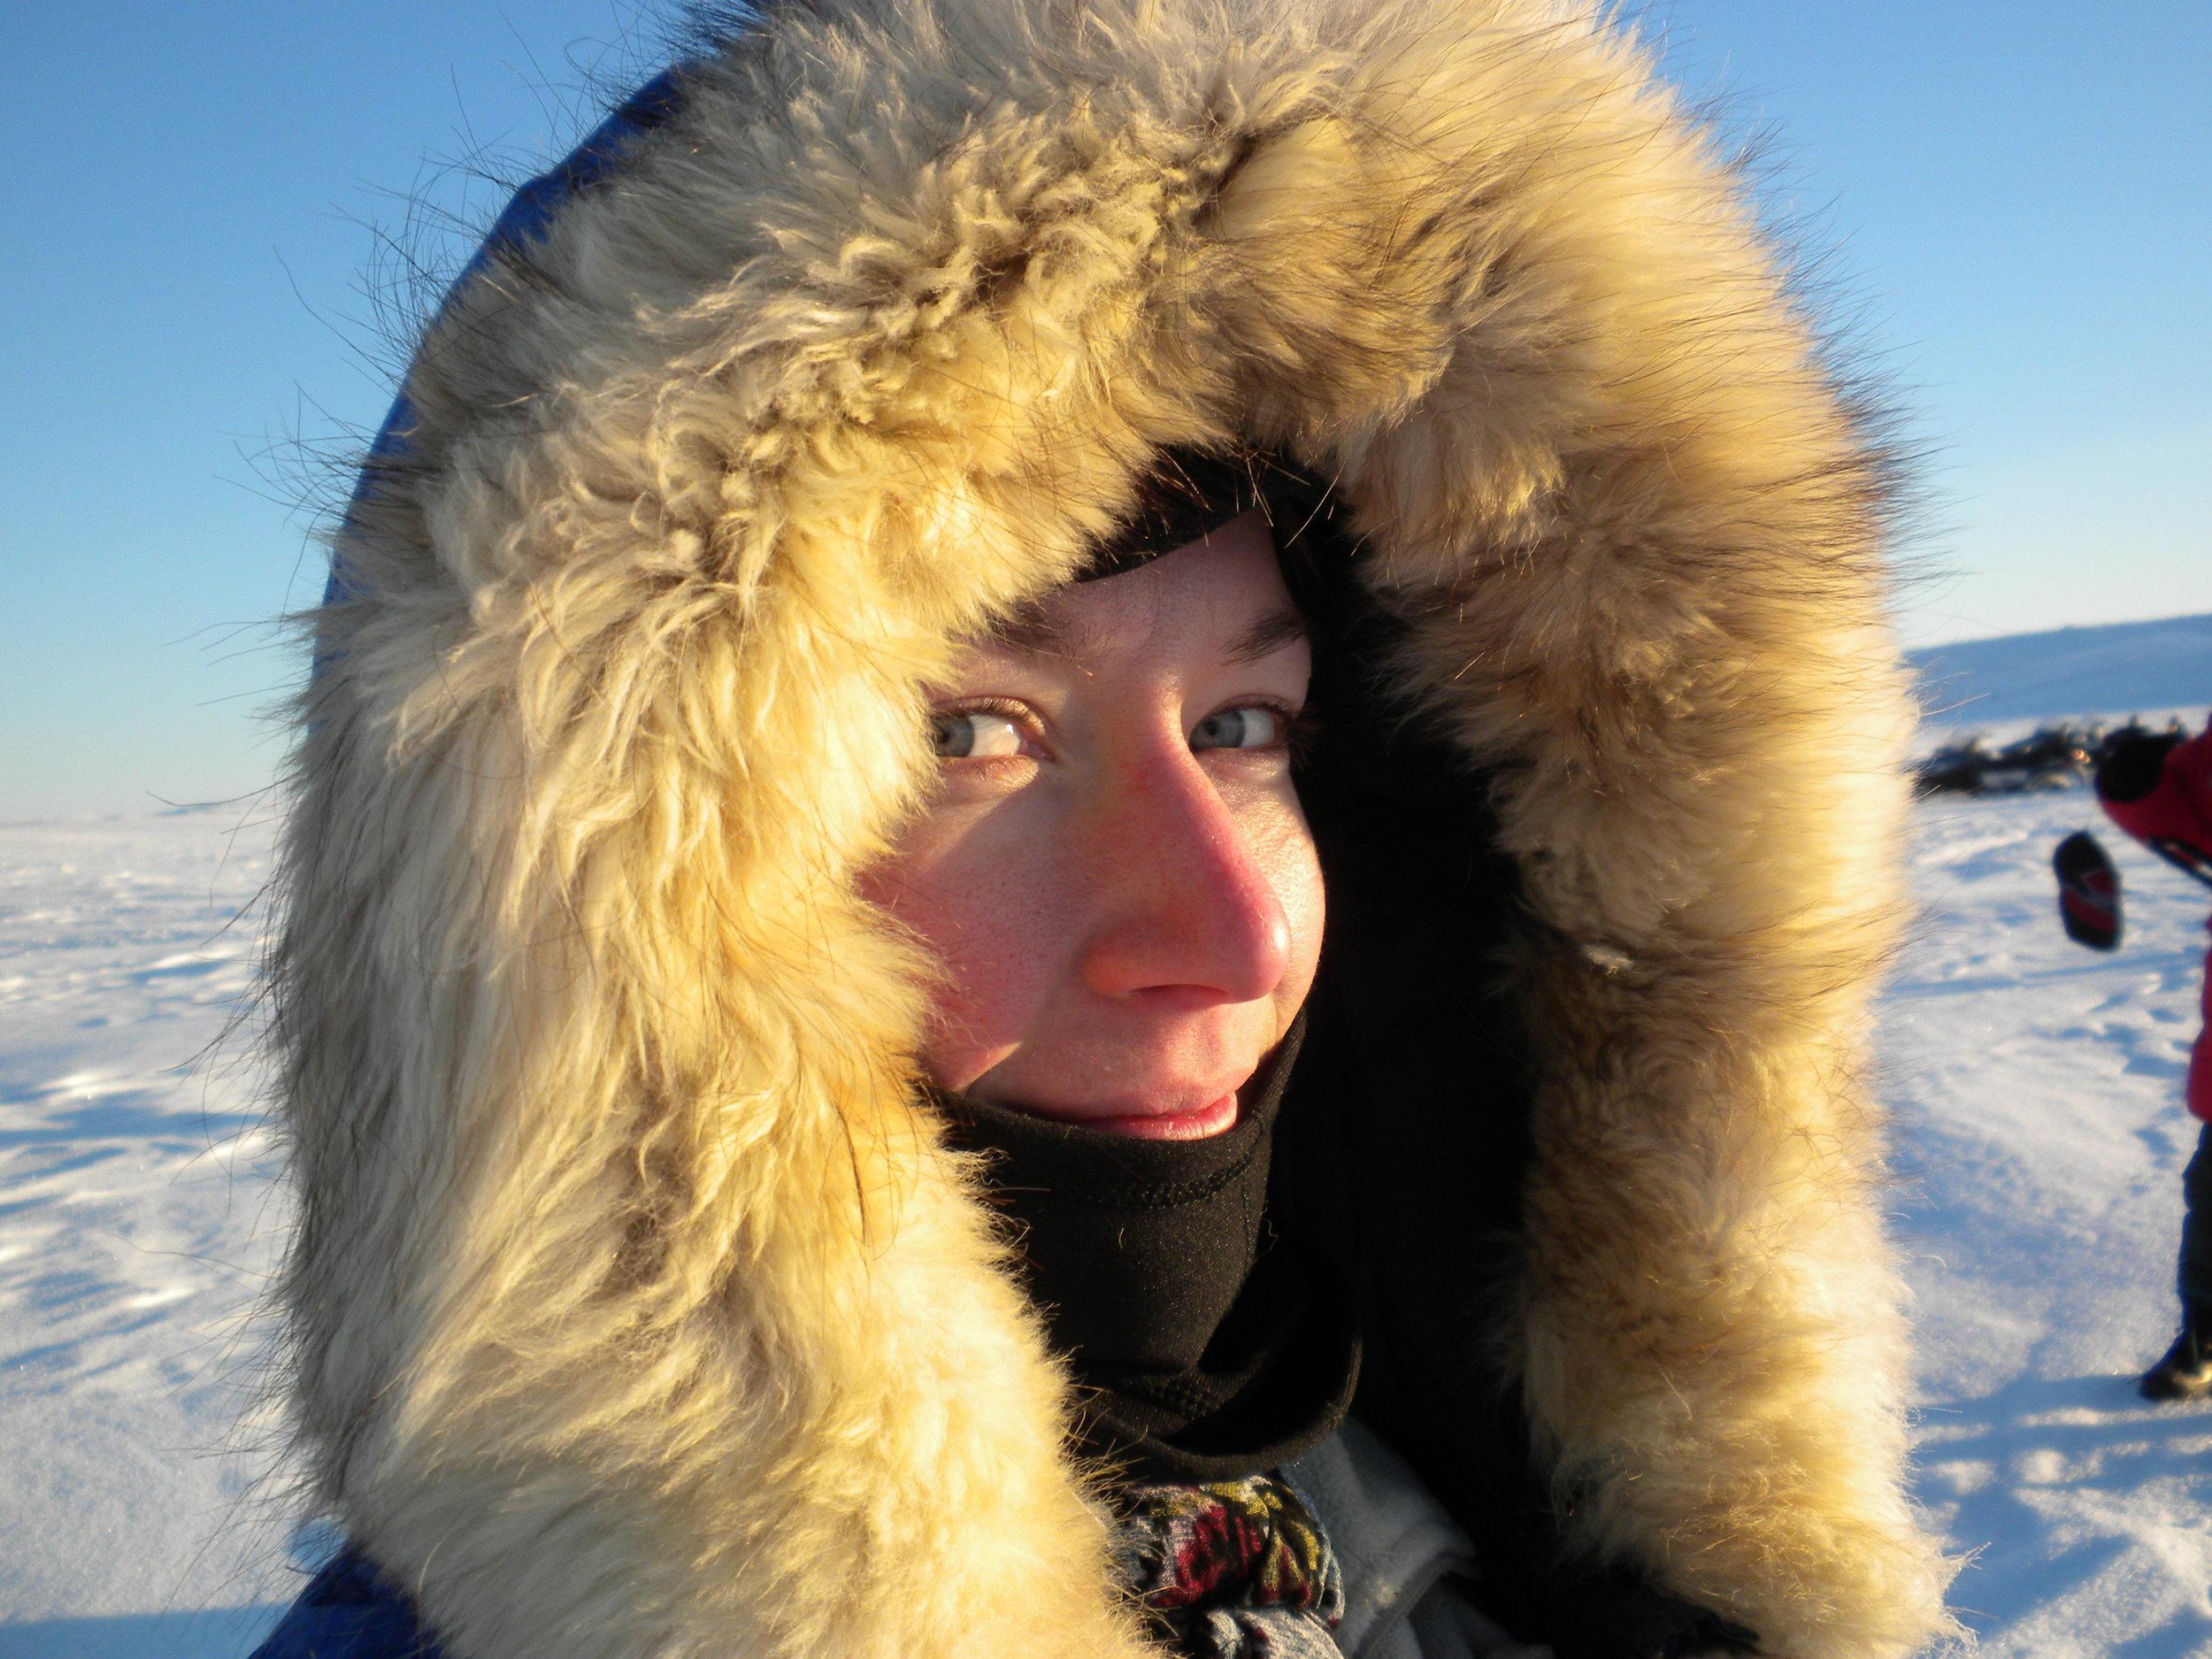 Standing on the arctic tundra in Puvirnituq, Nunavik, Canada